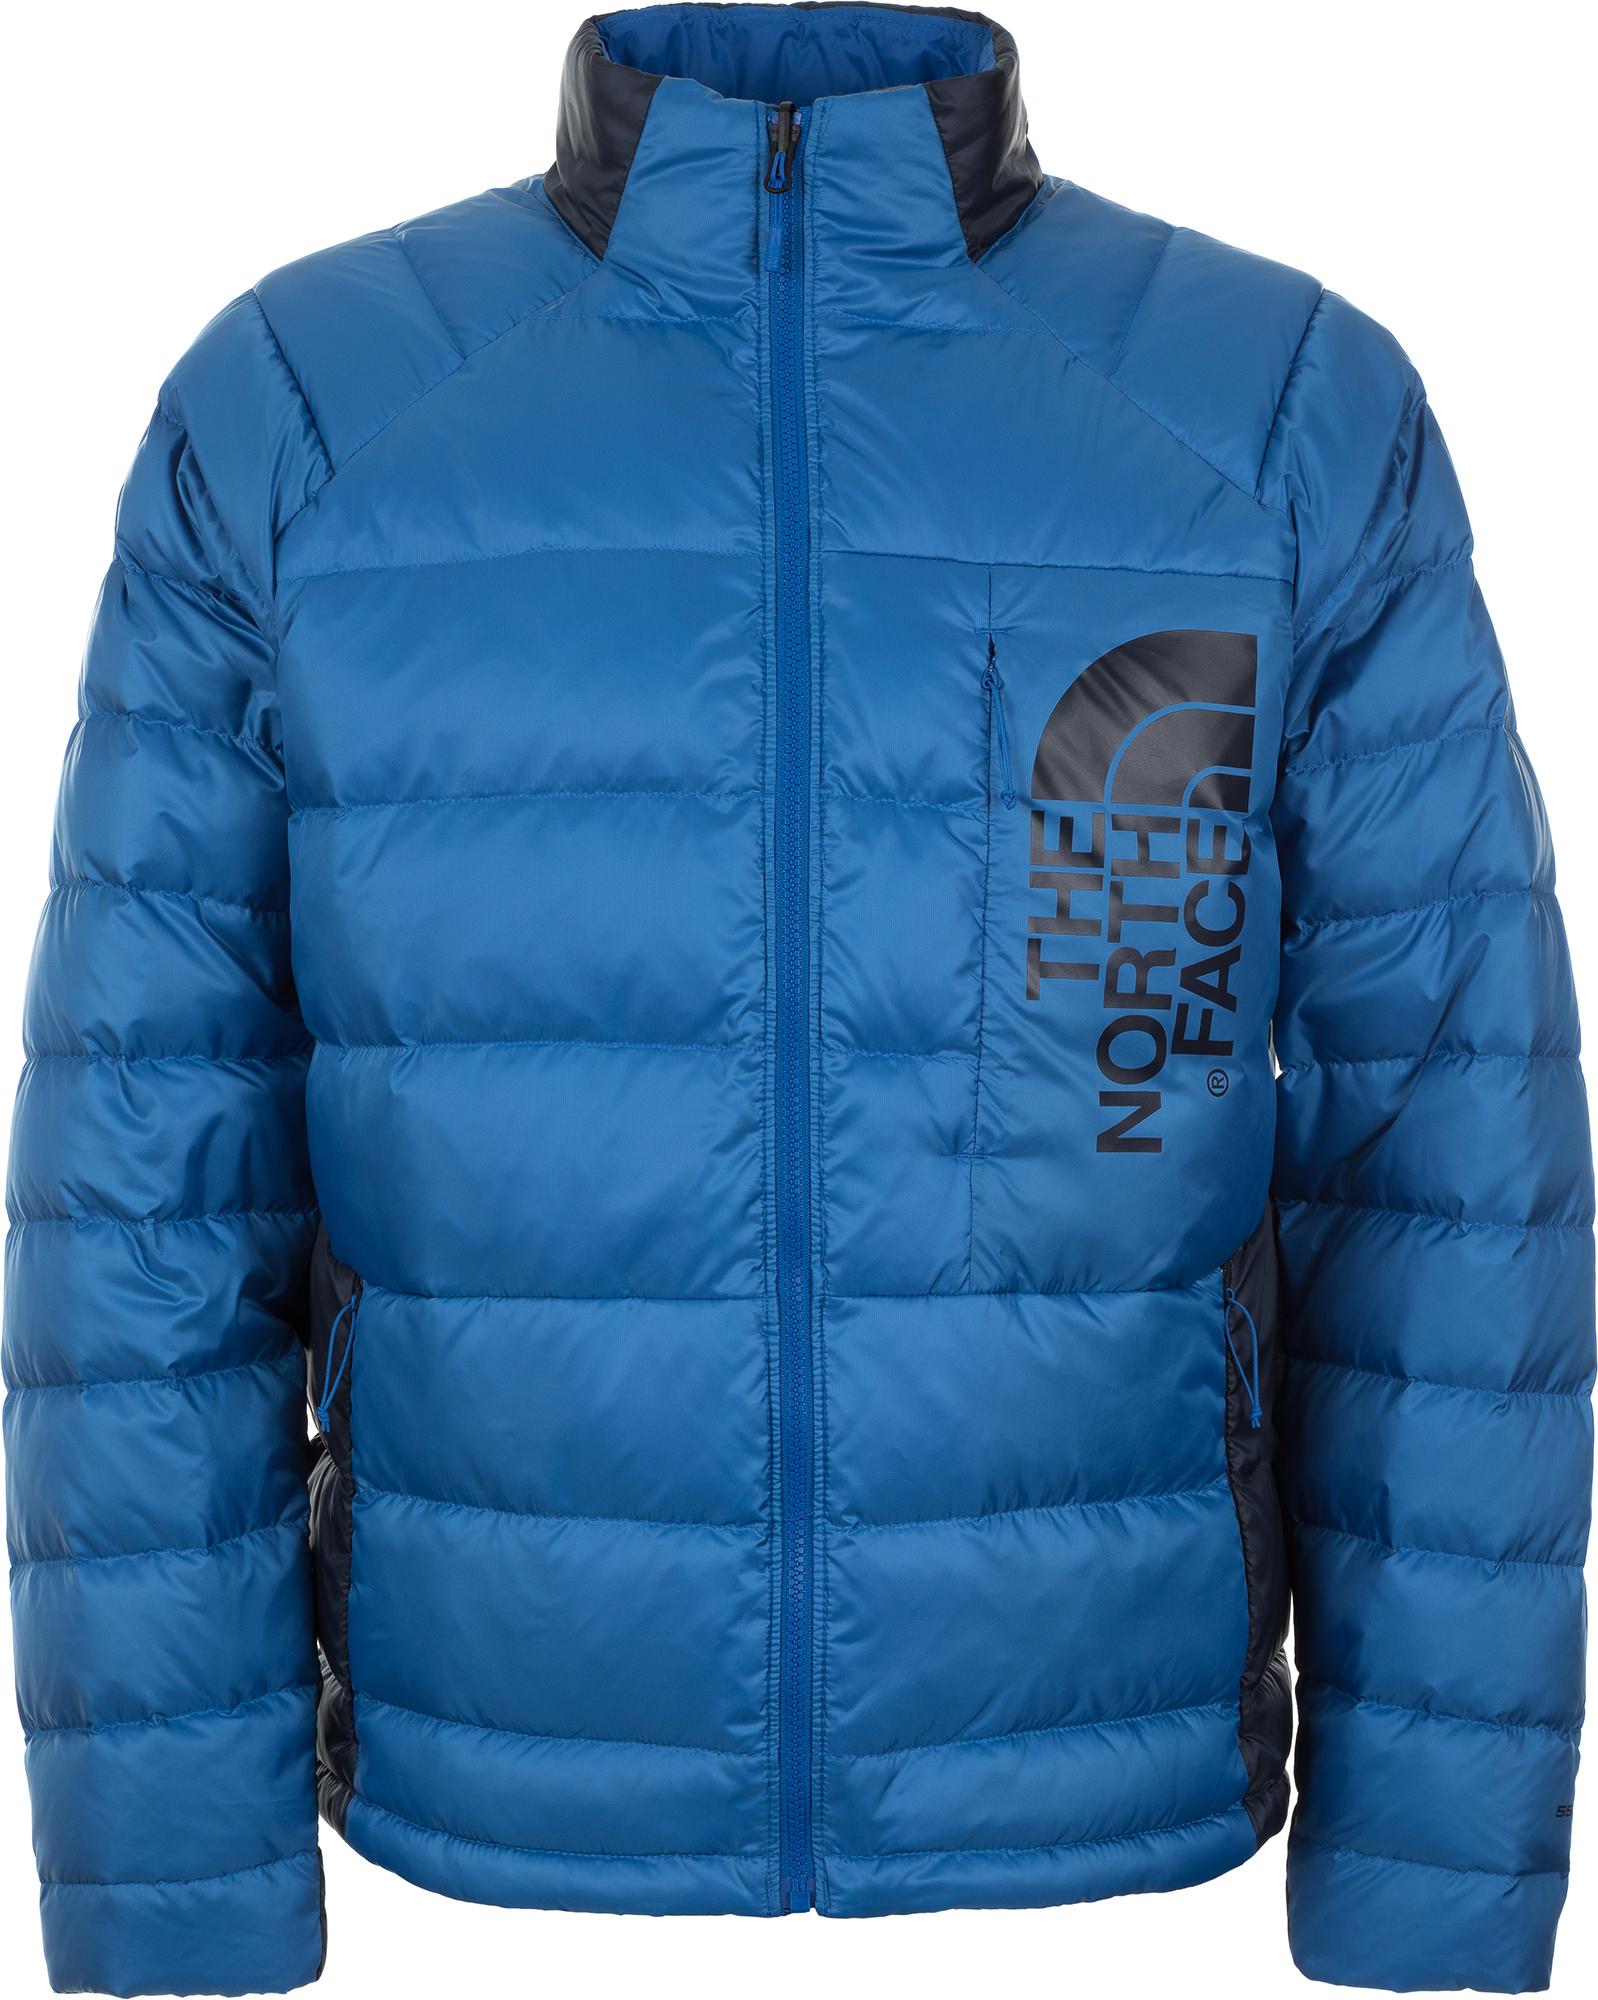 The North Face Куртка пуховая мужская Peakfrontier II, размер 50